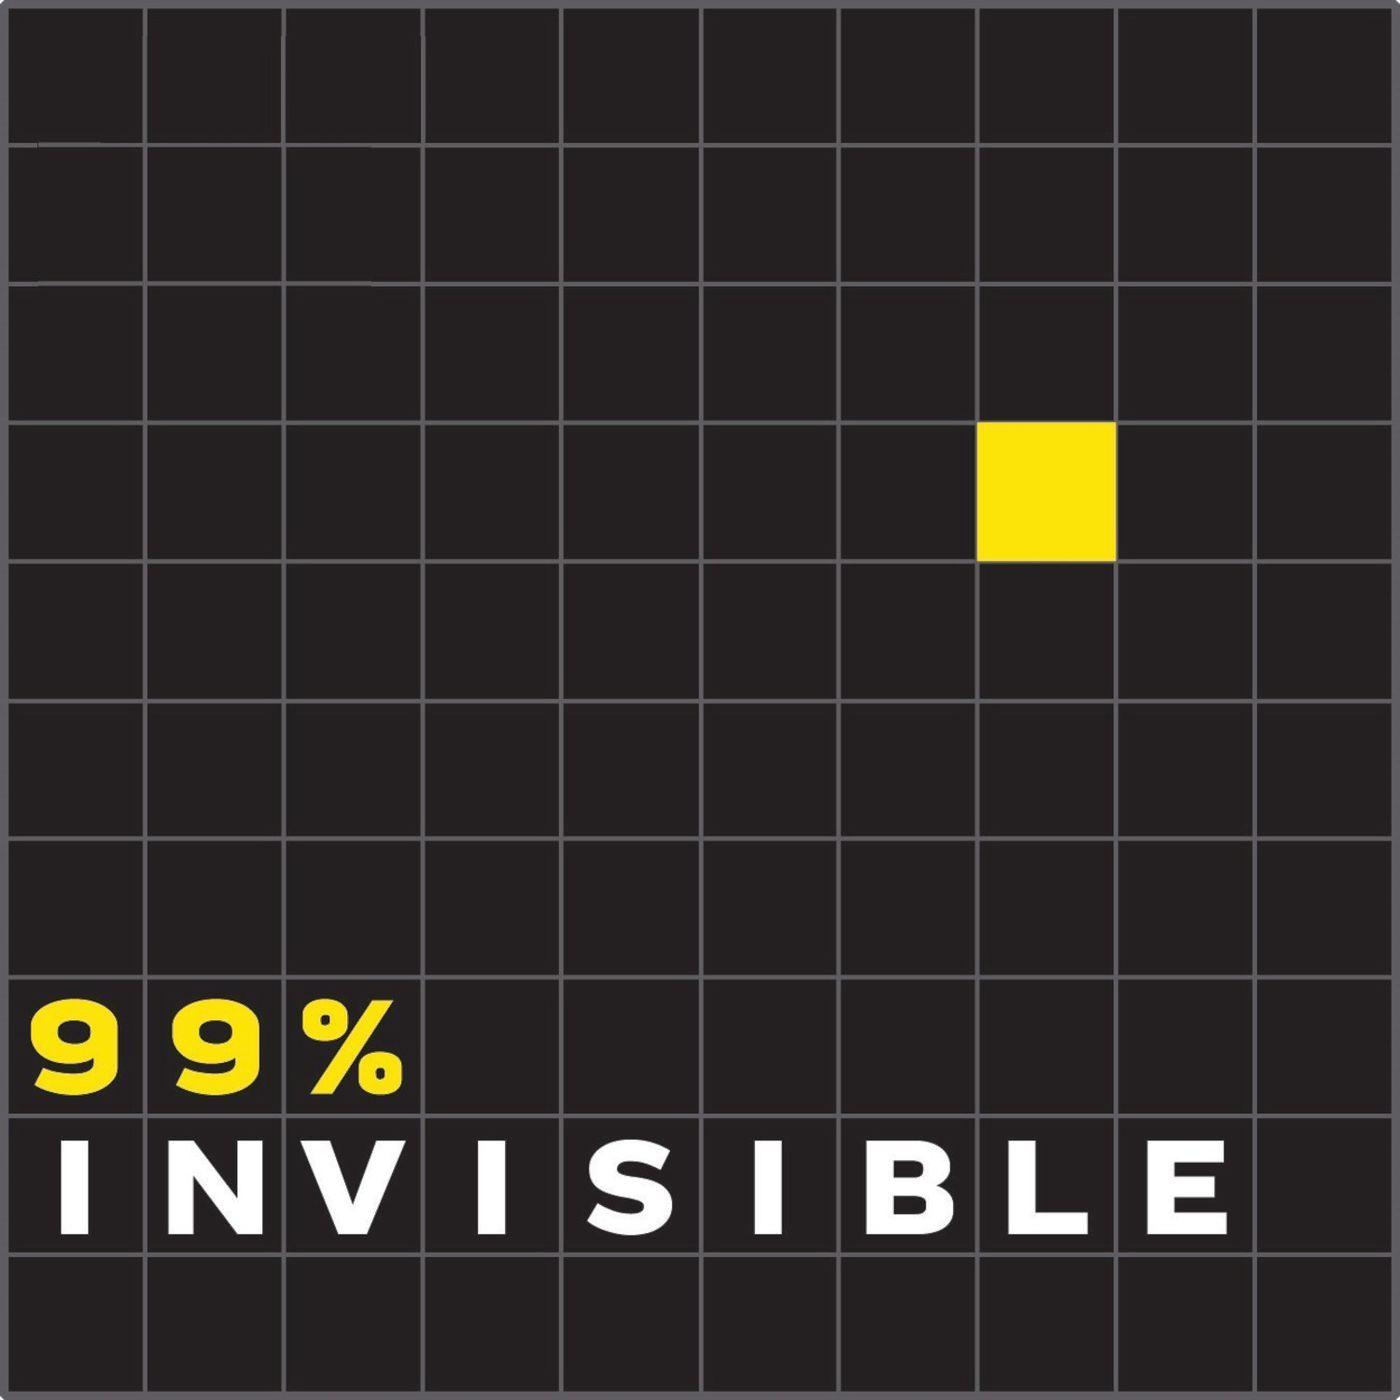 99 invisible podcast